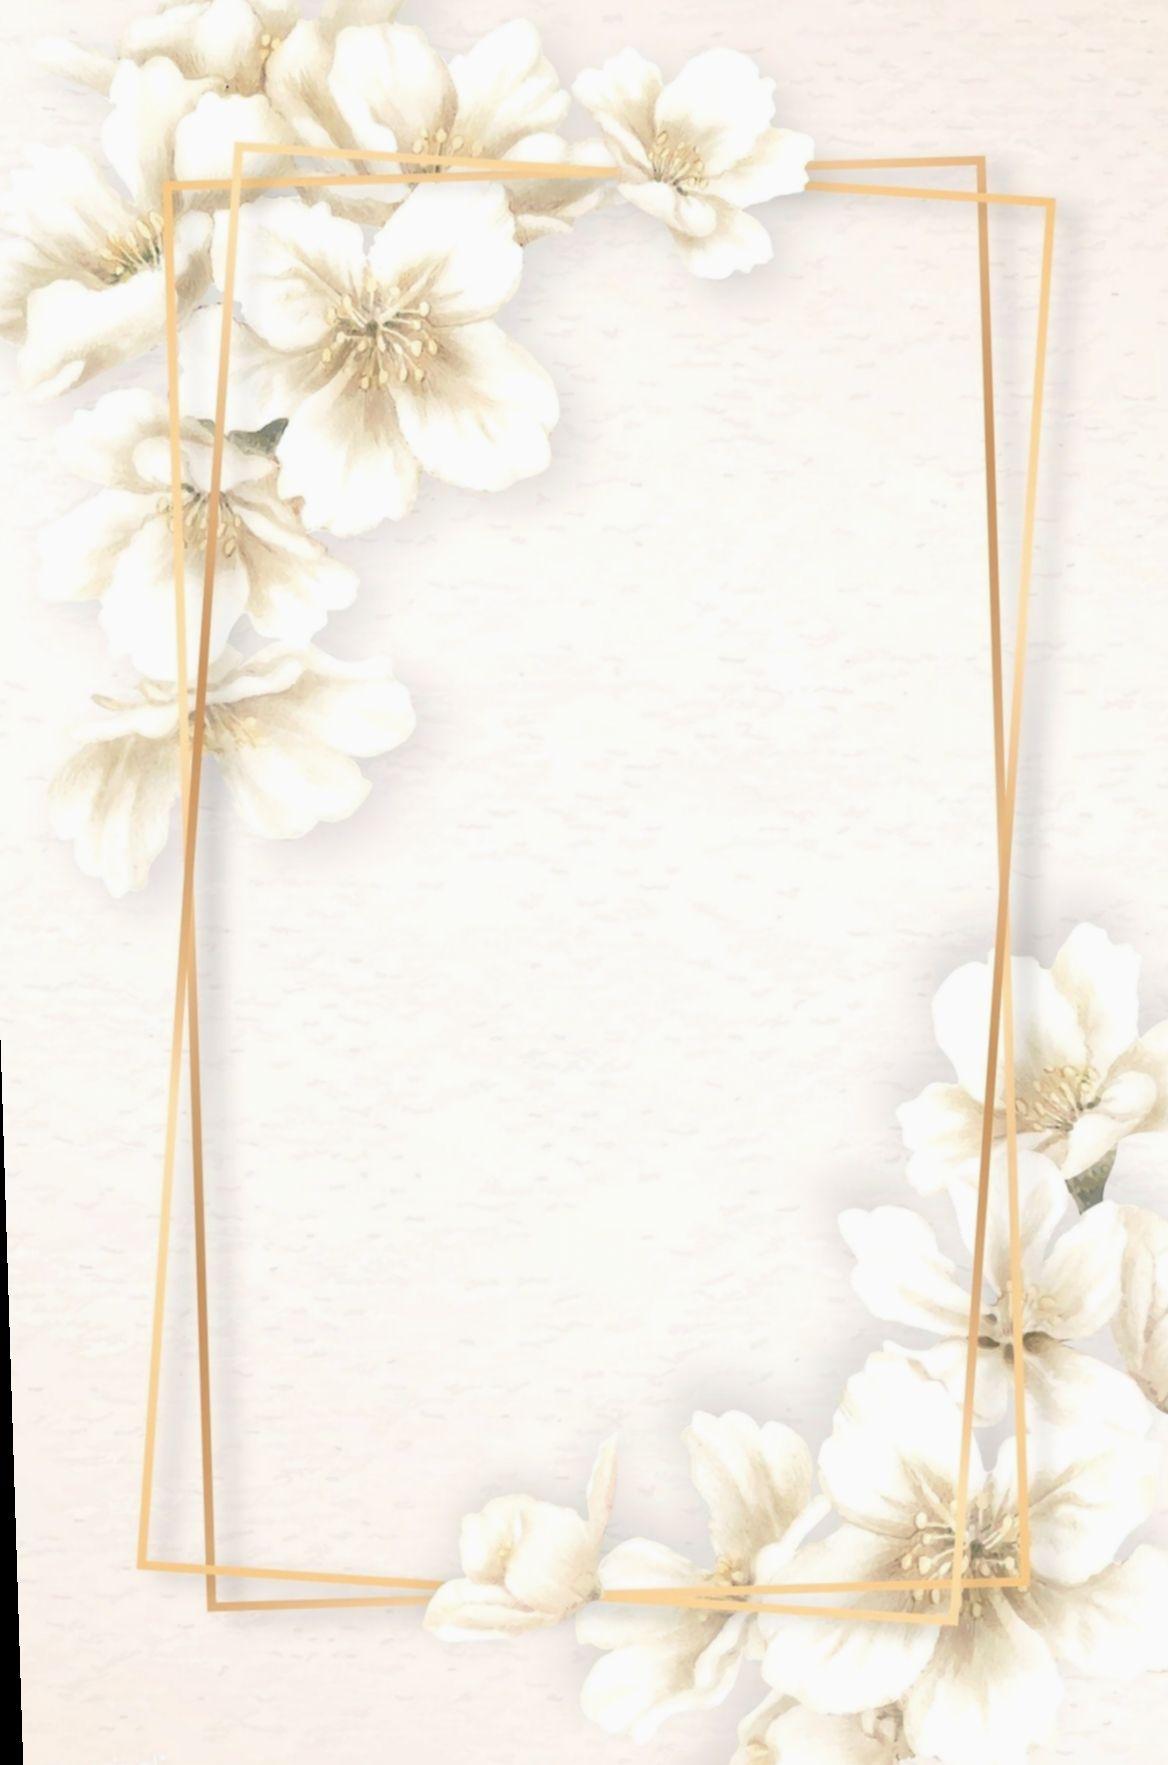 Cute Illustration Doodles Wallpaper Amizades Mundorosa Ilhadogovernador Acfotografia Poster Floral Molduras Para Convites De Casamento Ilustracoes Florais